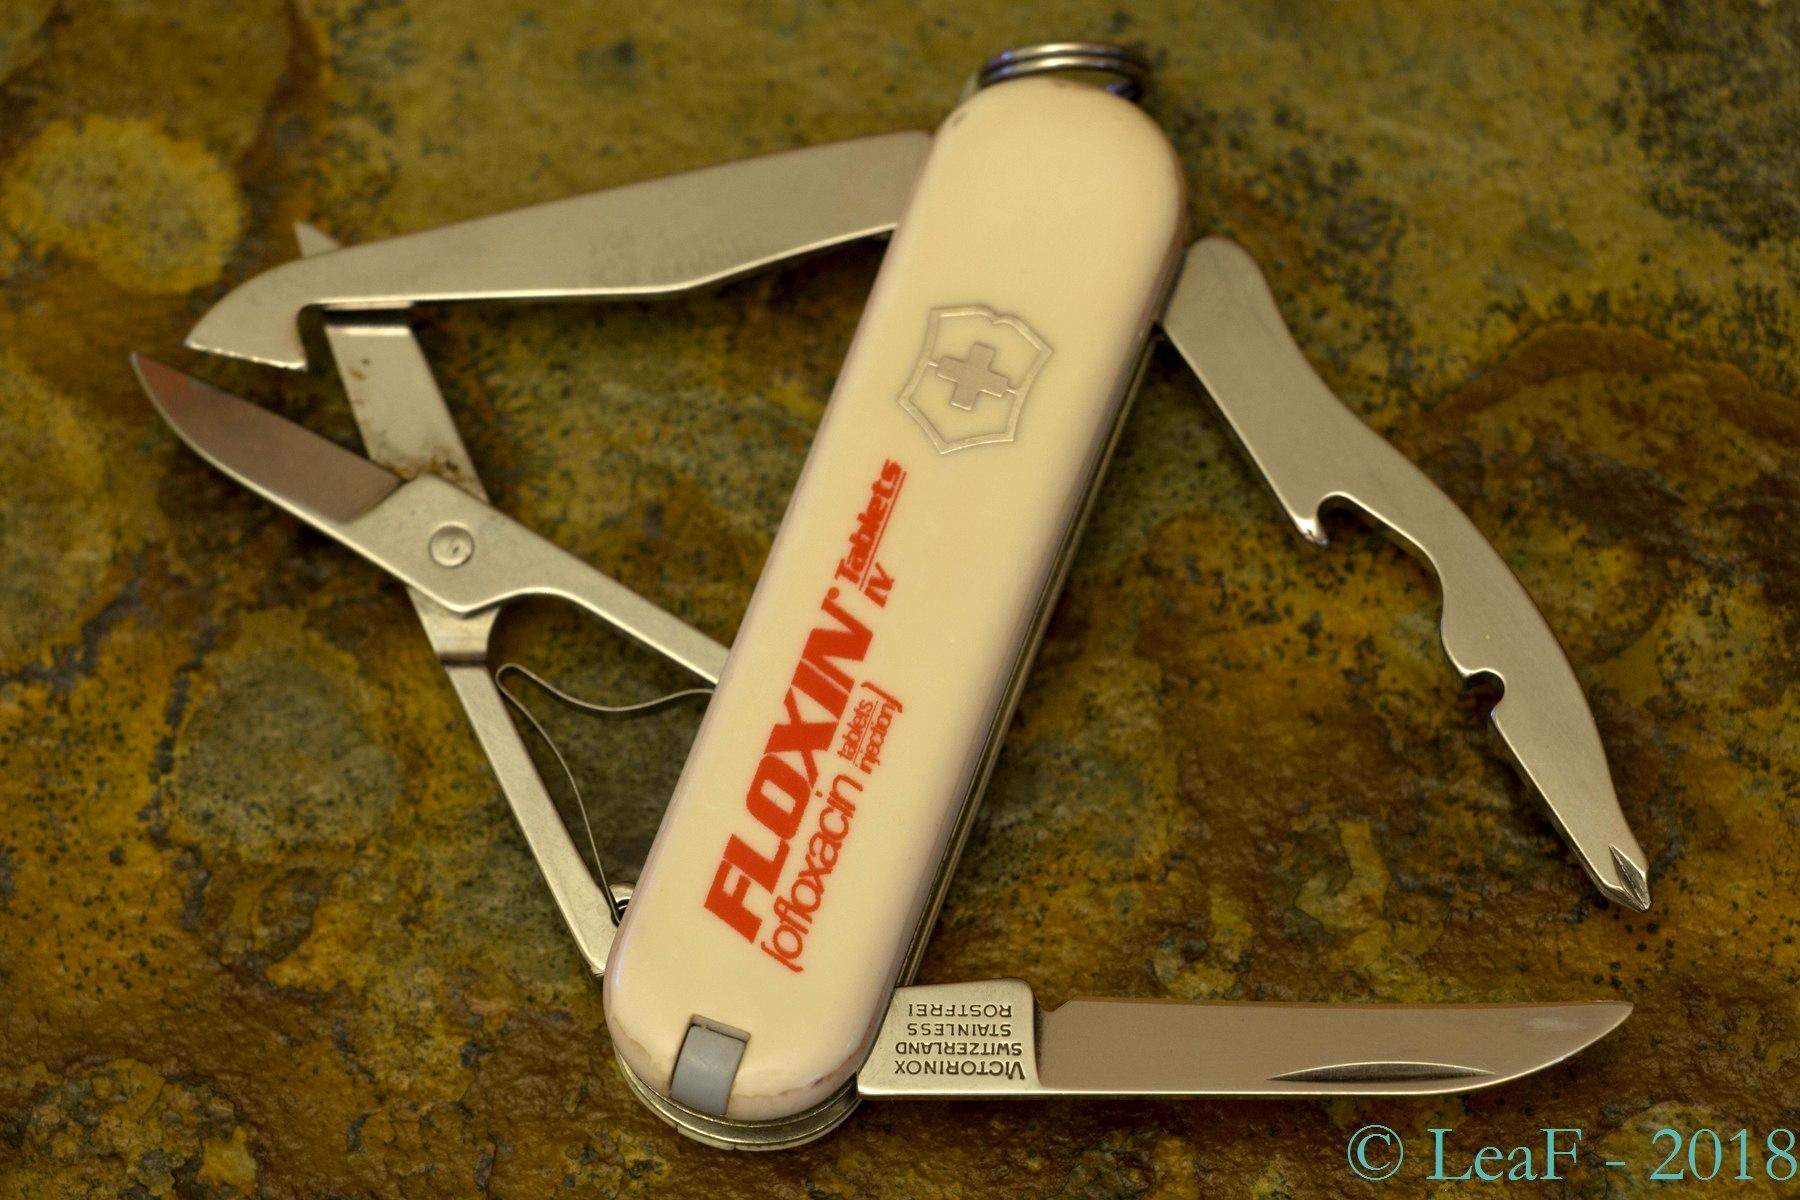 294 Rambler Pharmaceutical Leaf S Victorinox Knives